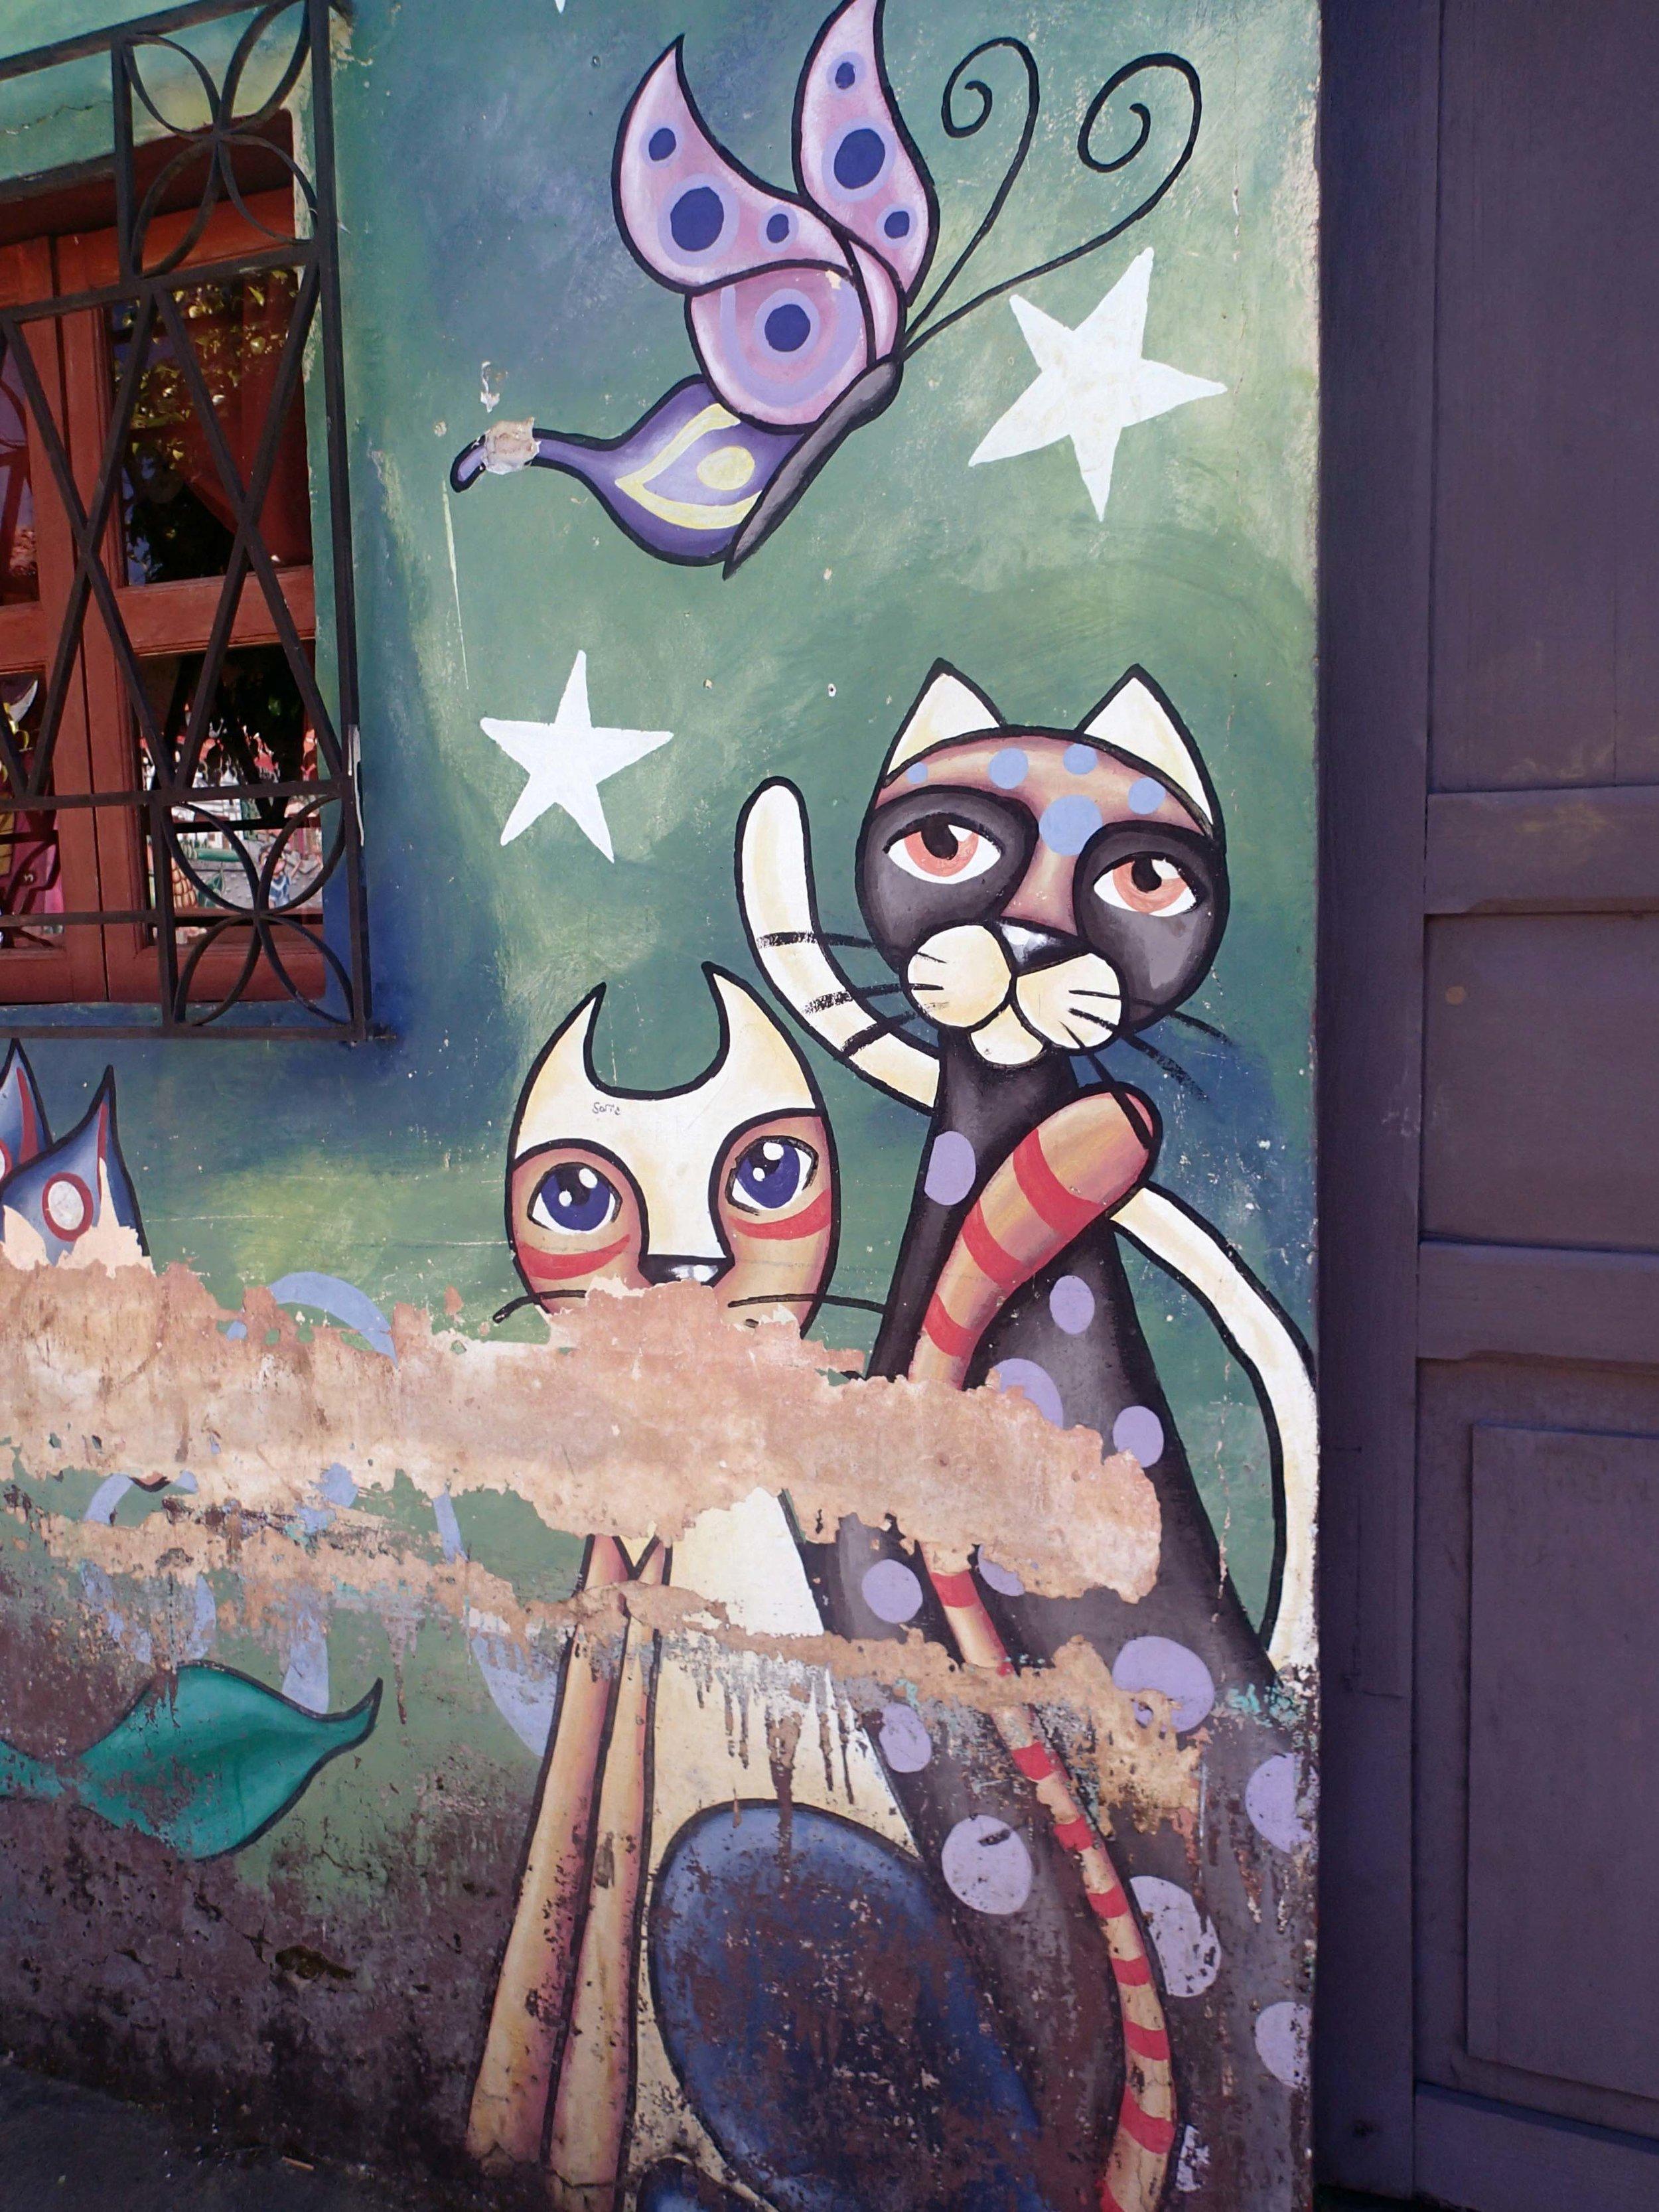 Ataco mural.jpg